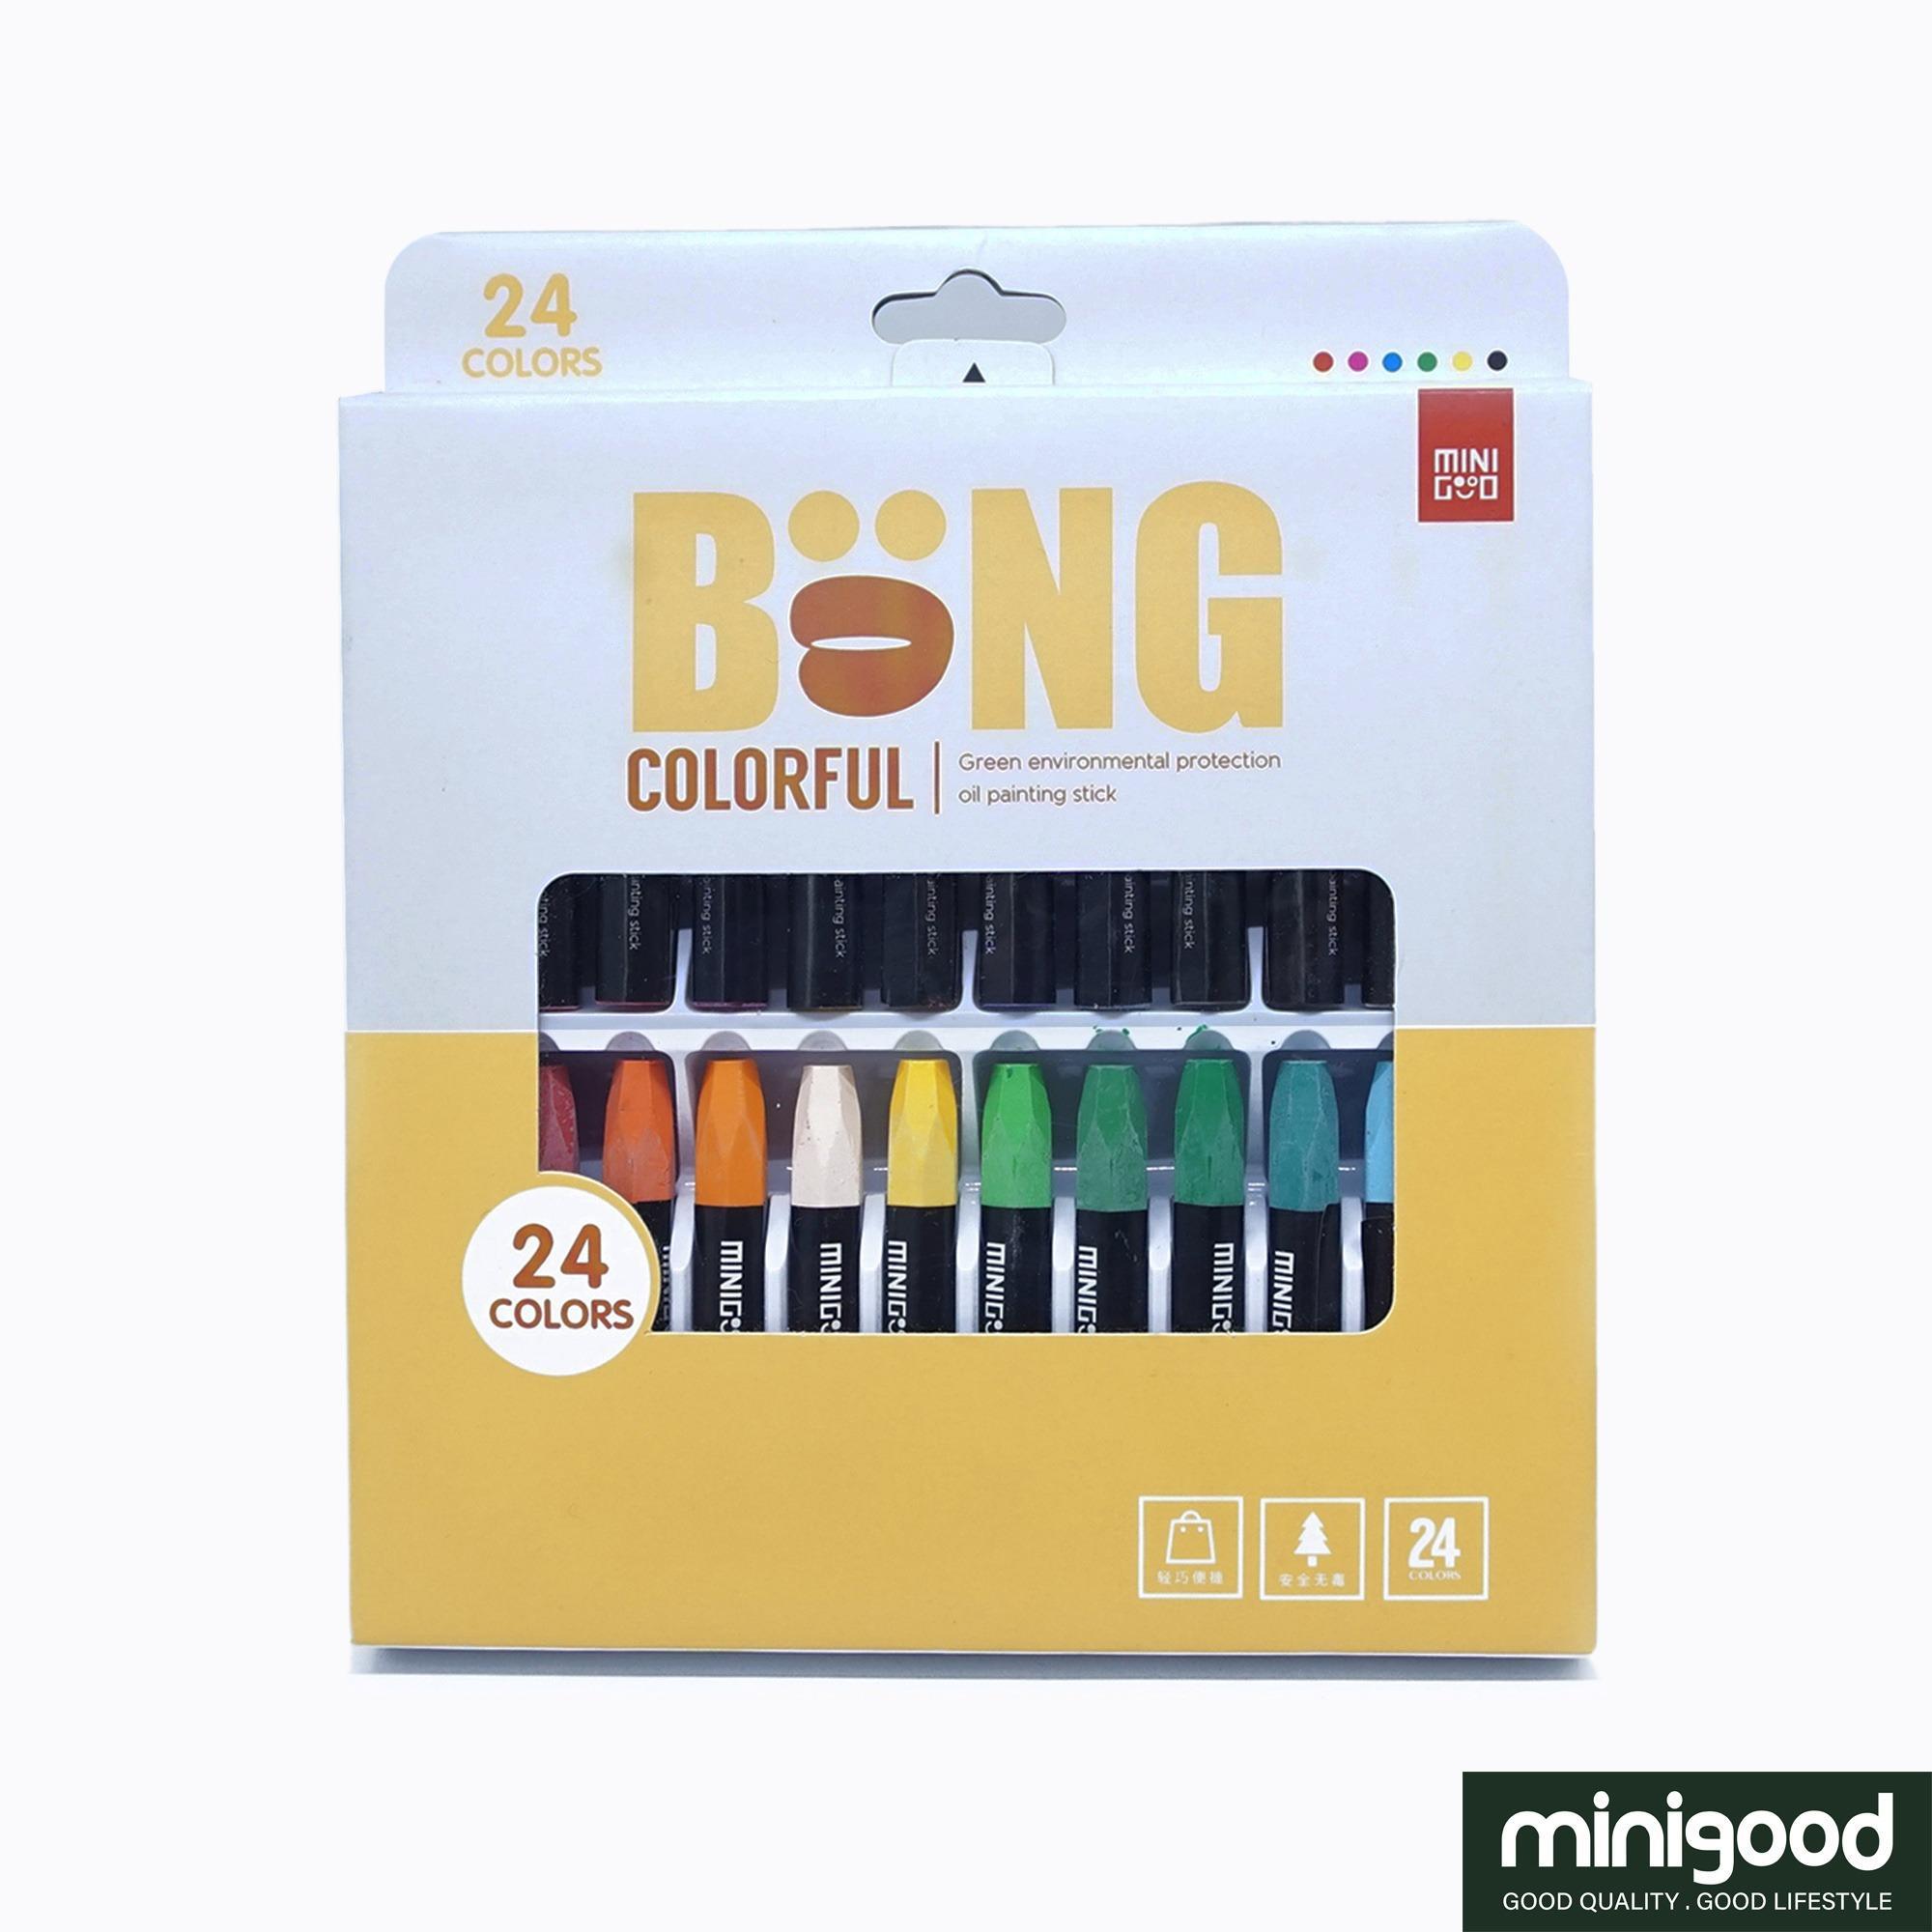 minigood NEW PRODUCT pensil warna crayon set gambar bahan campuran minyak partikel lilin 24Colors